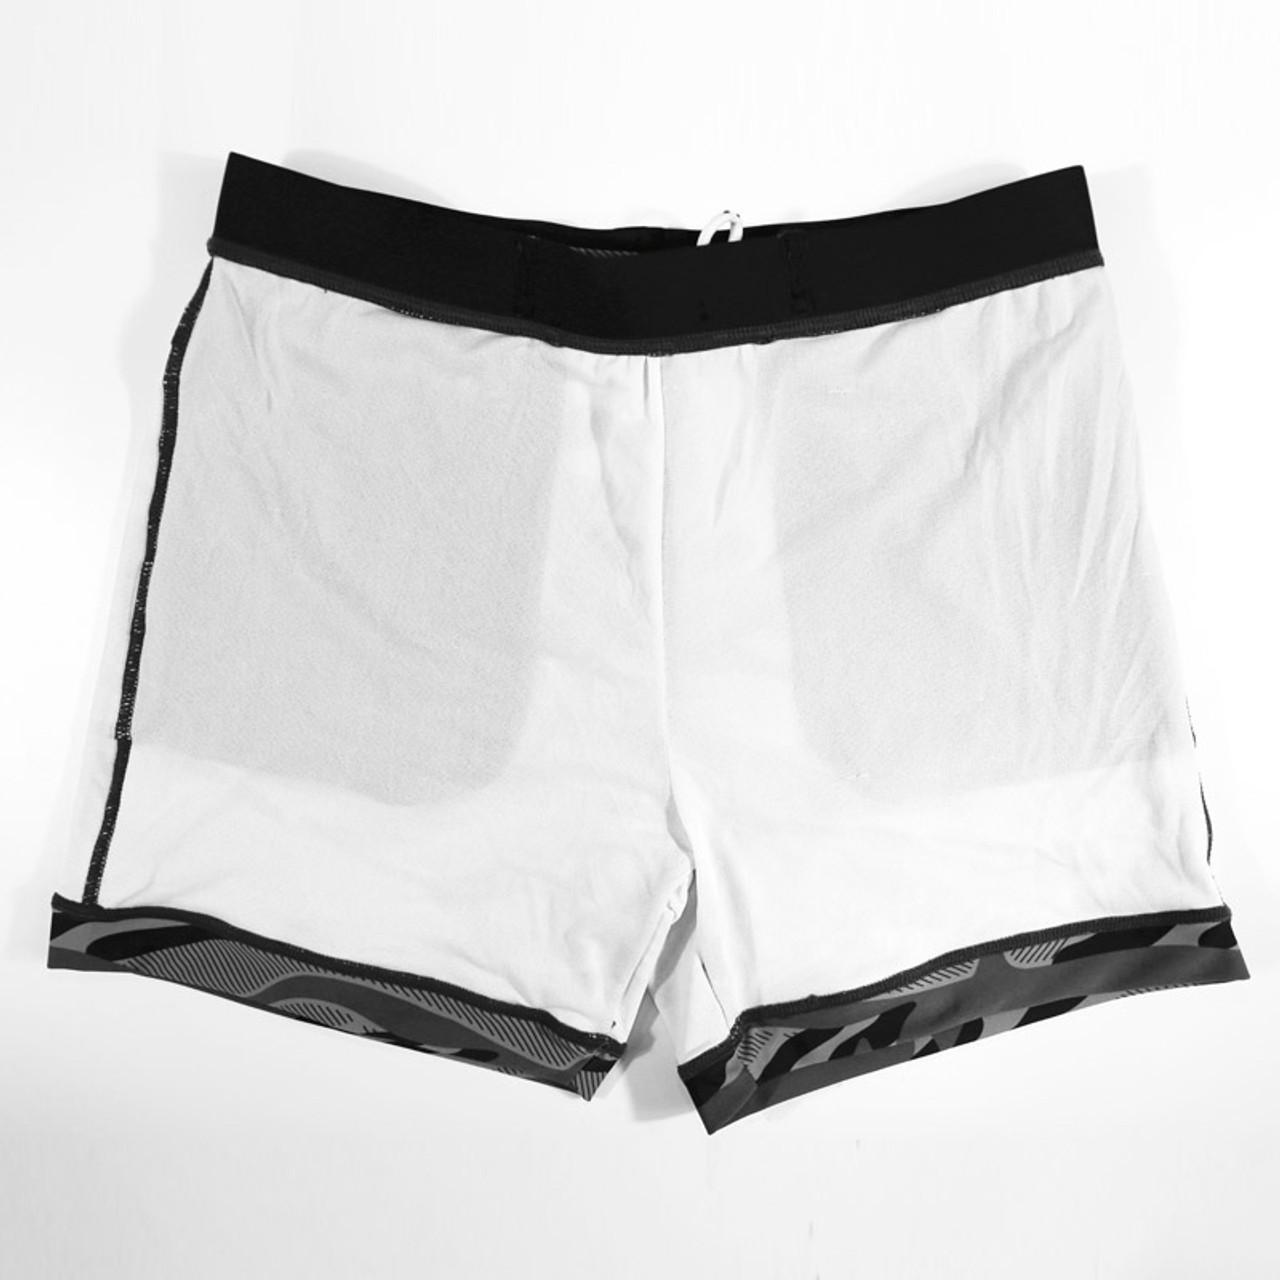 d60db24669 ... Taddlee Brand Sexy Men's Swimwear Swimsuits Man Plus Big Size XXL  Spandex Beach Long Board Shorts ...